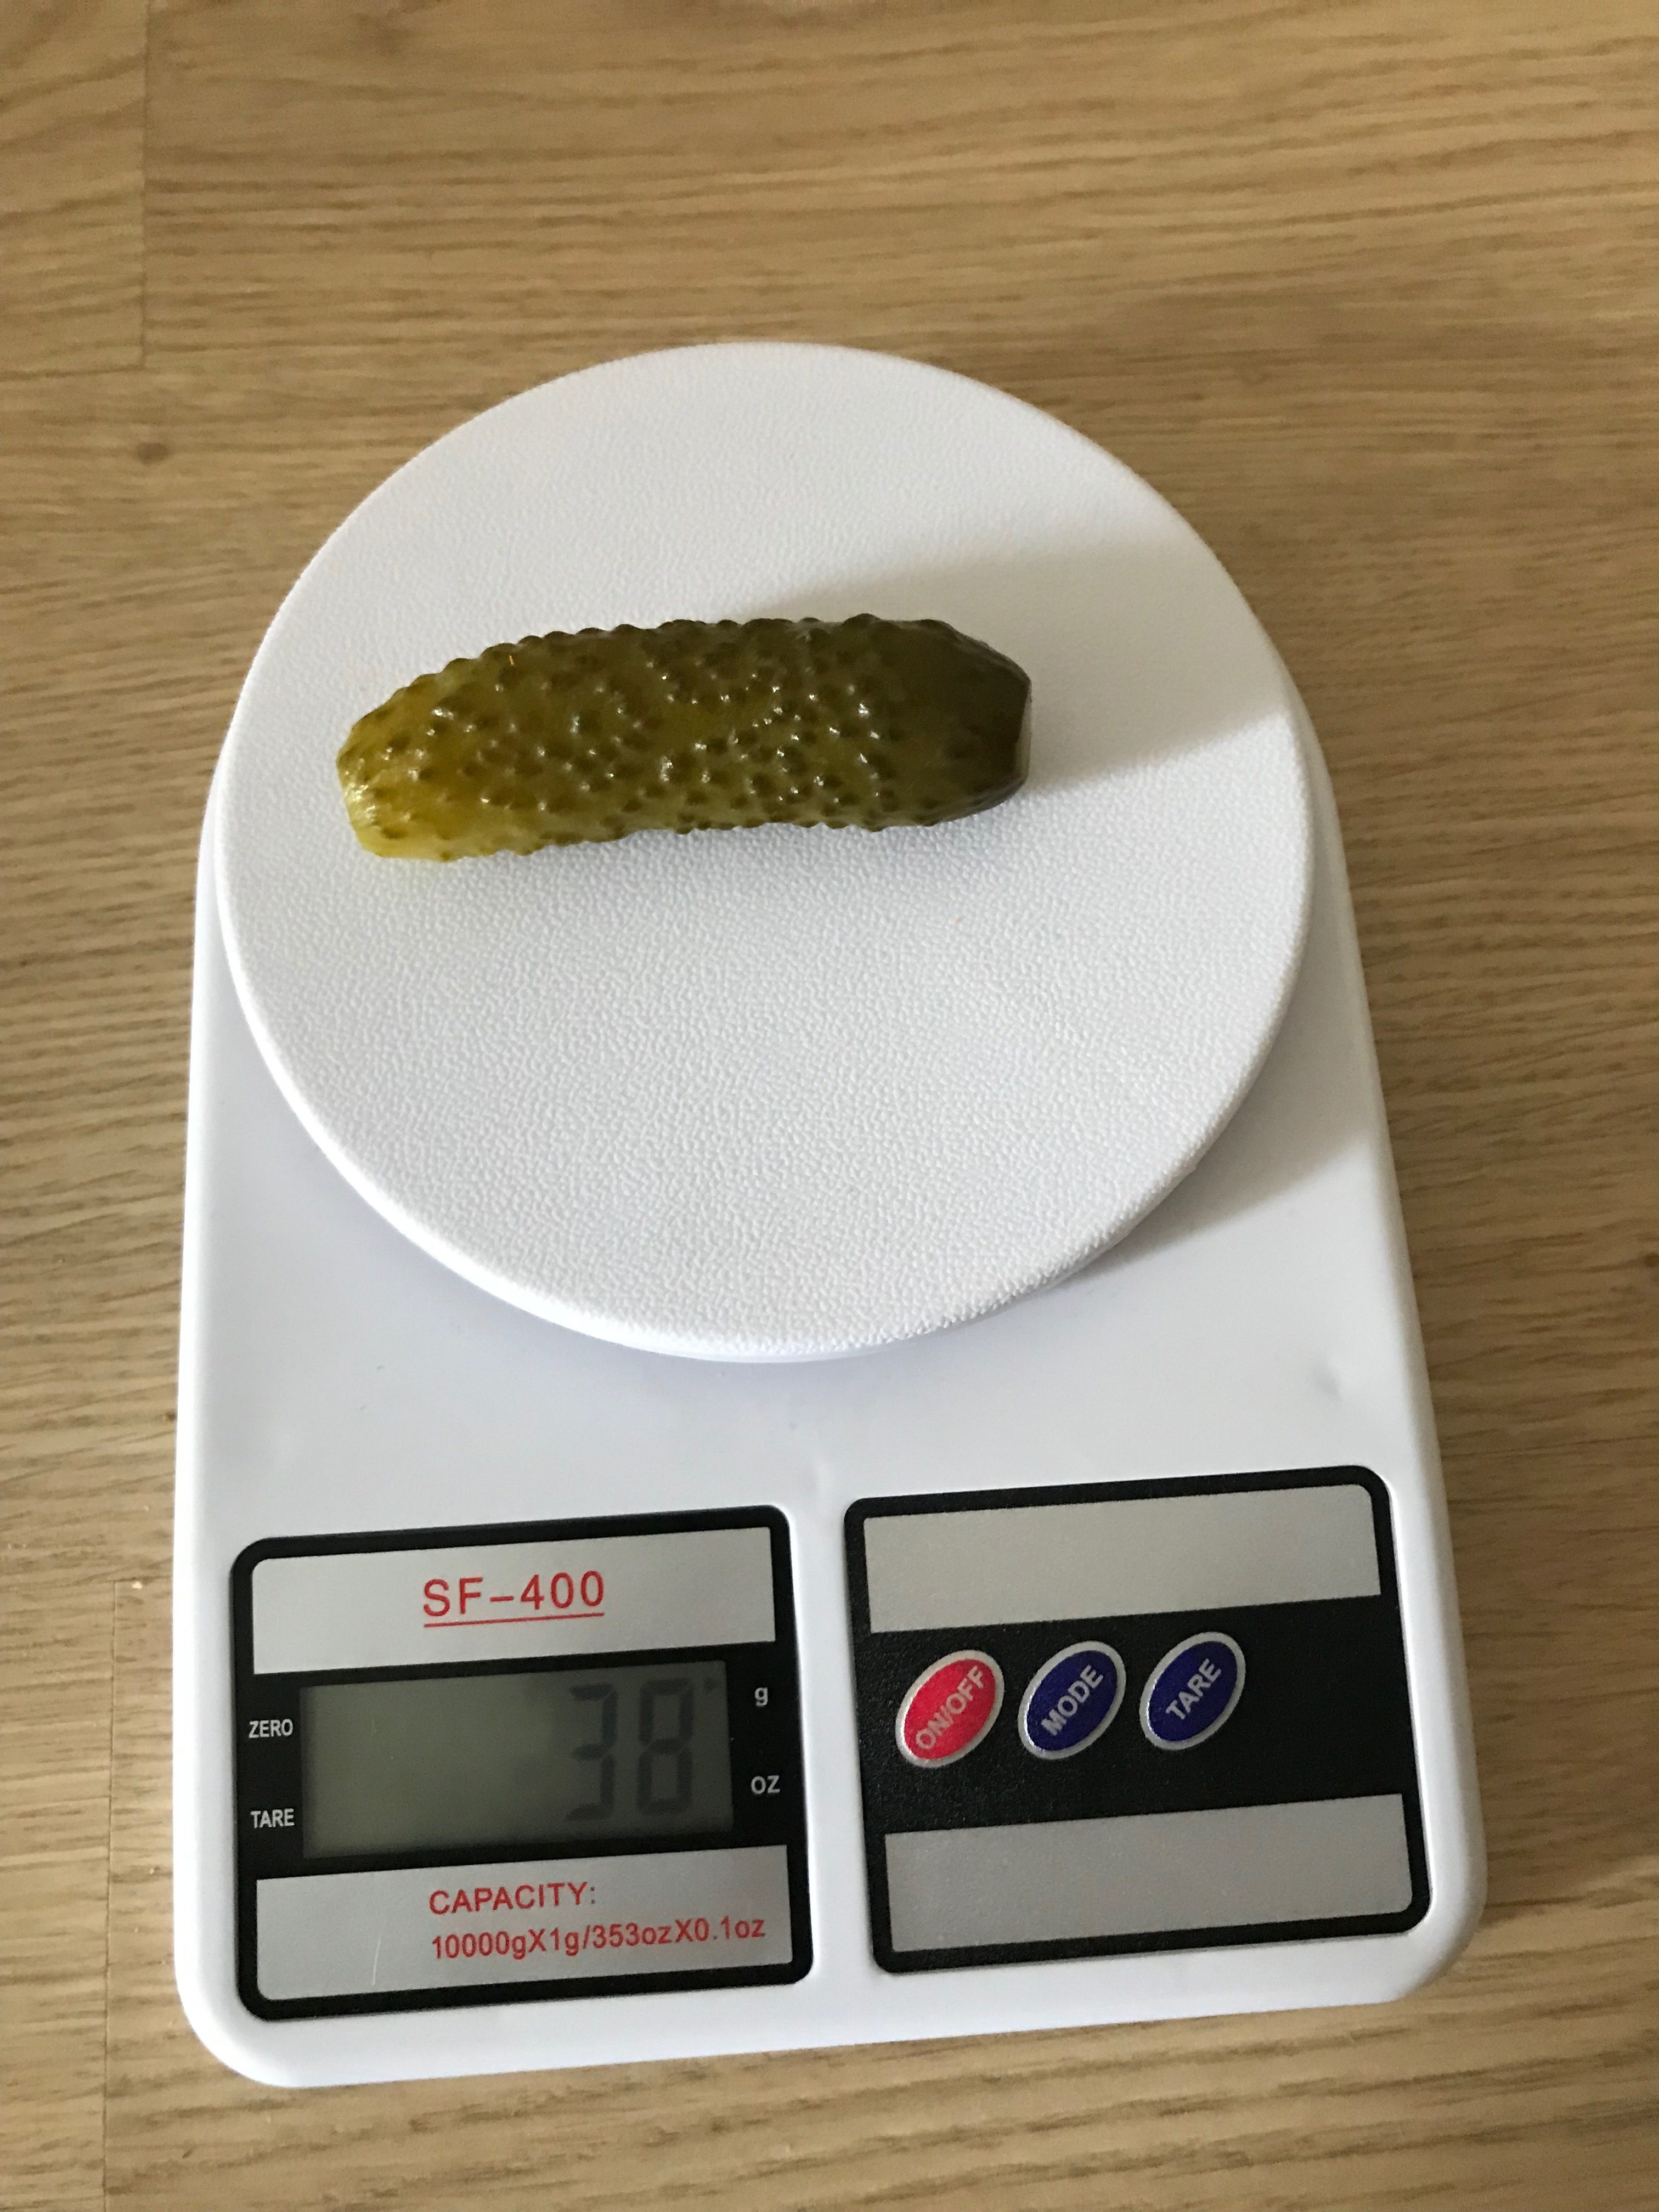 вес маринованного огурчика